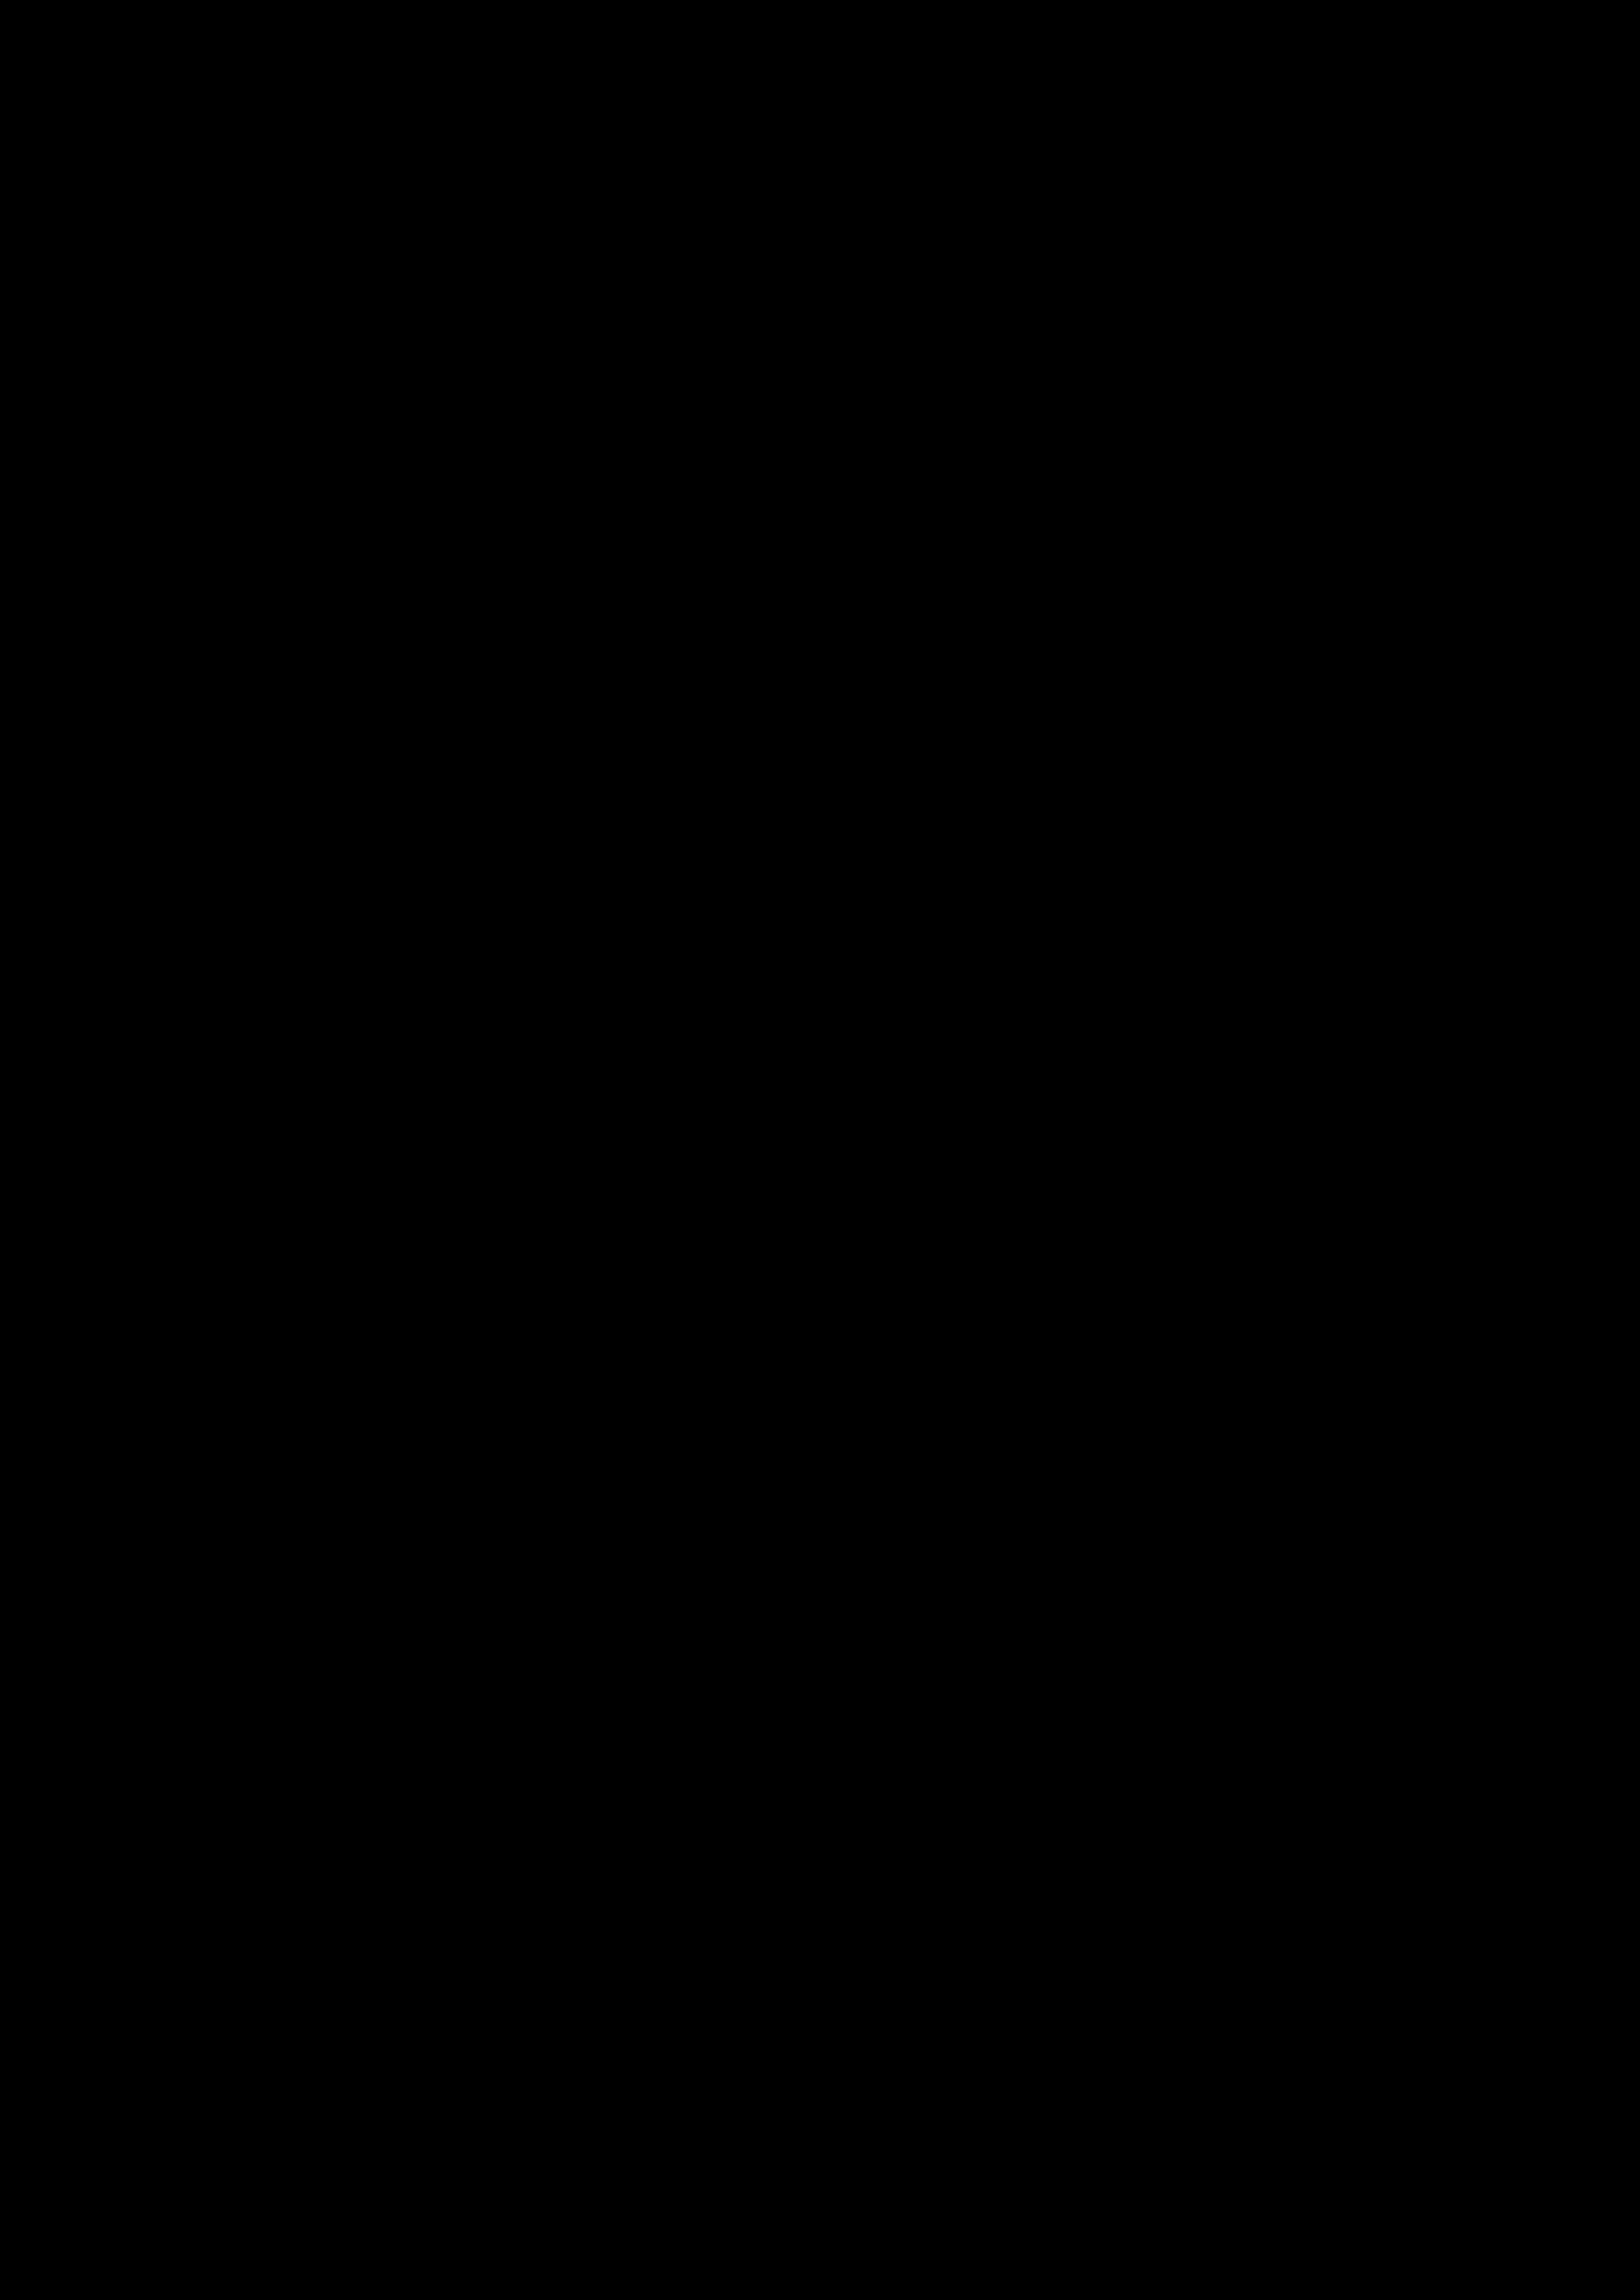 2018.10.04-novara-corso-inim-prime-base-001